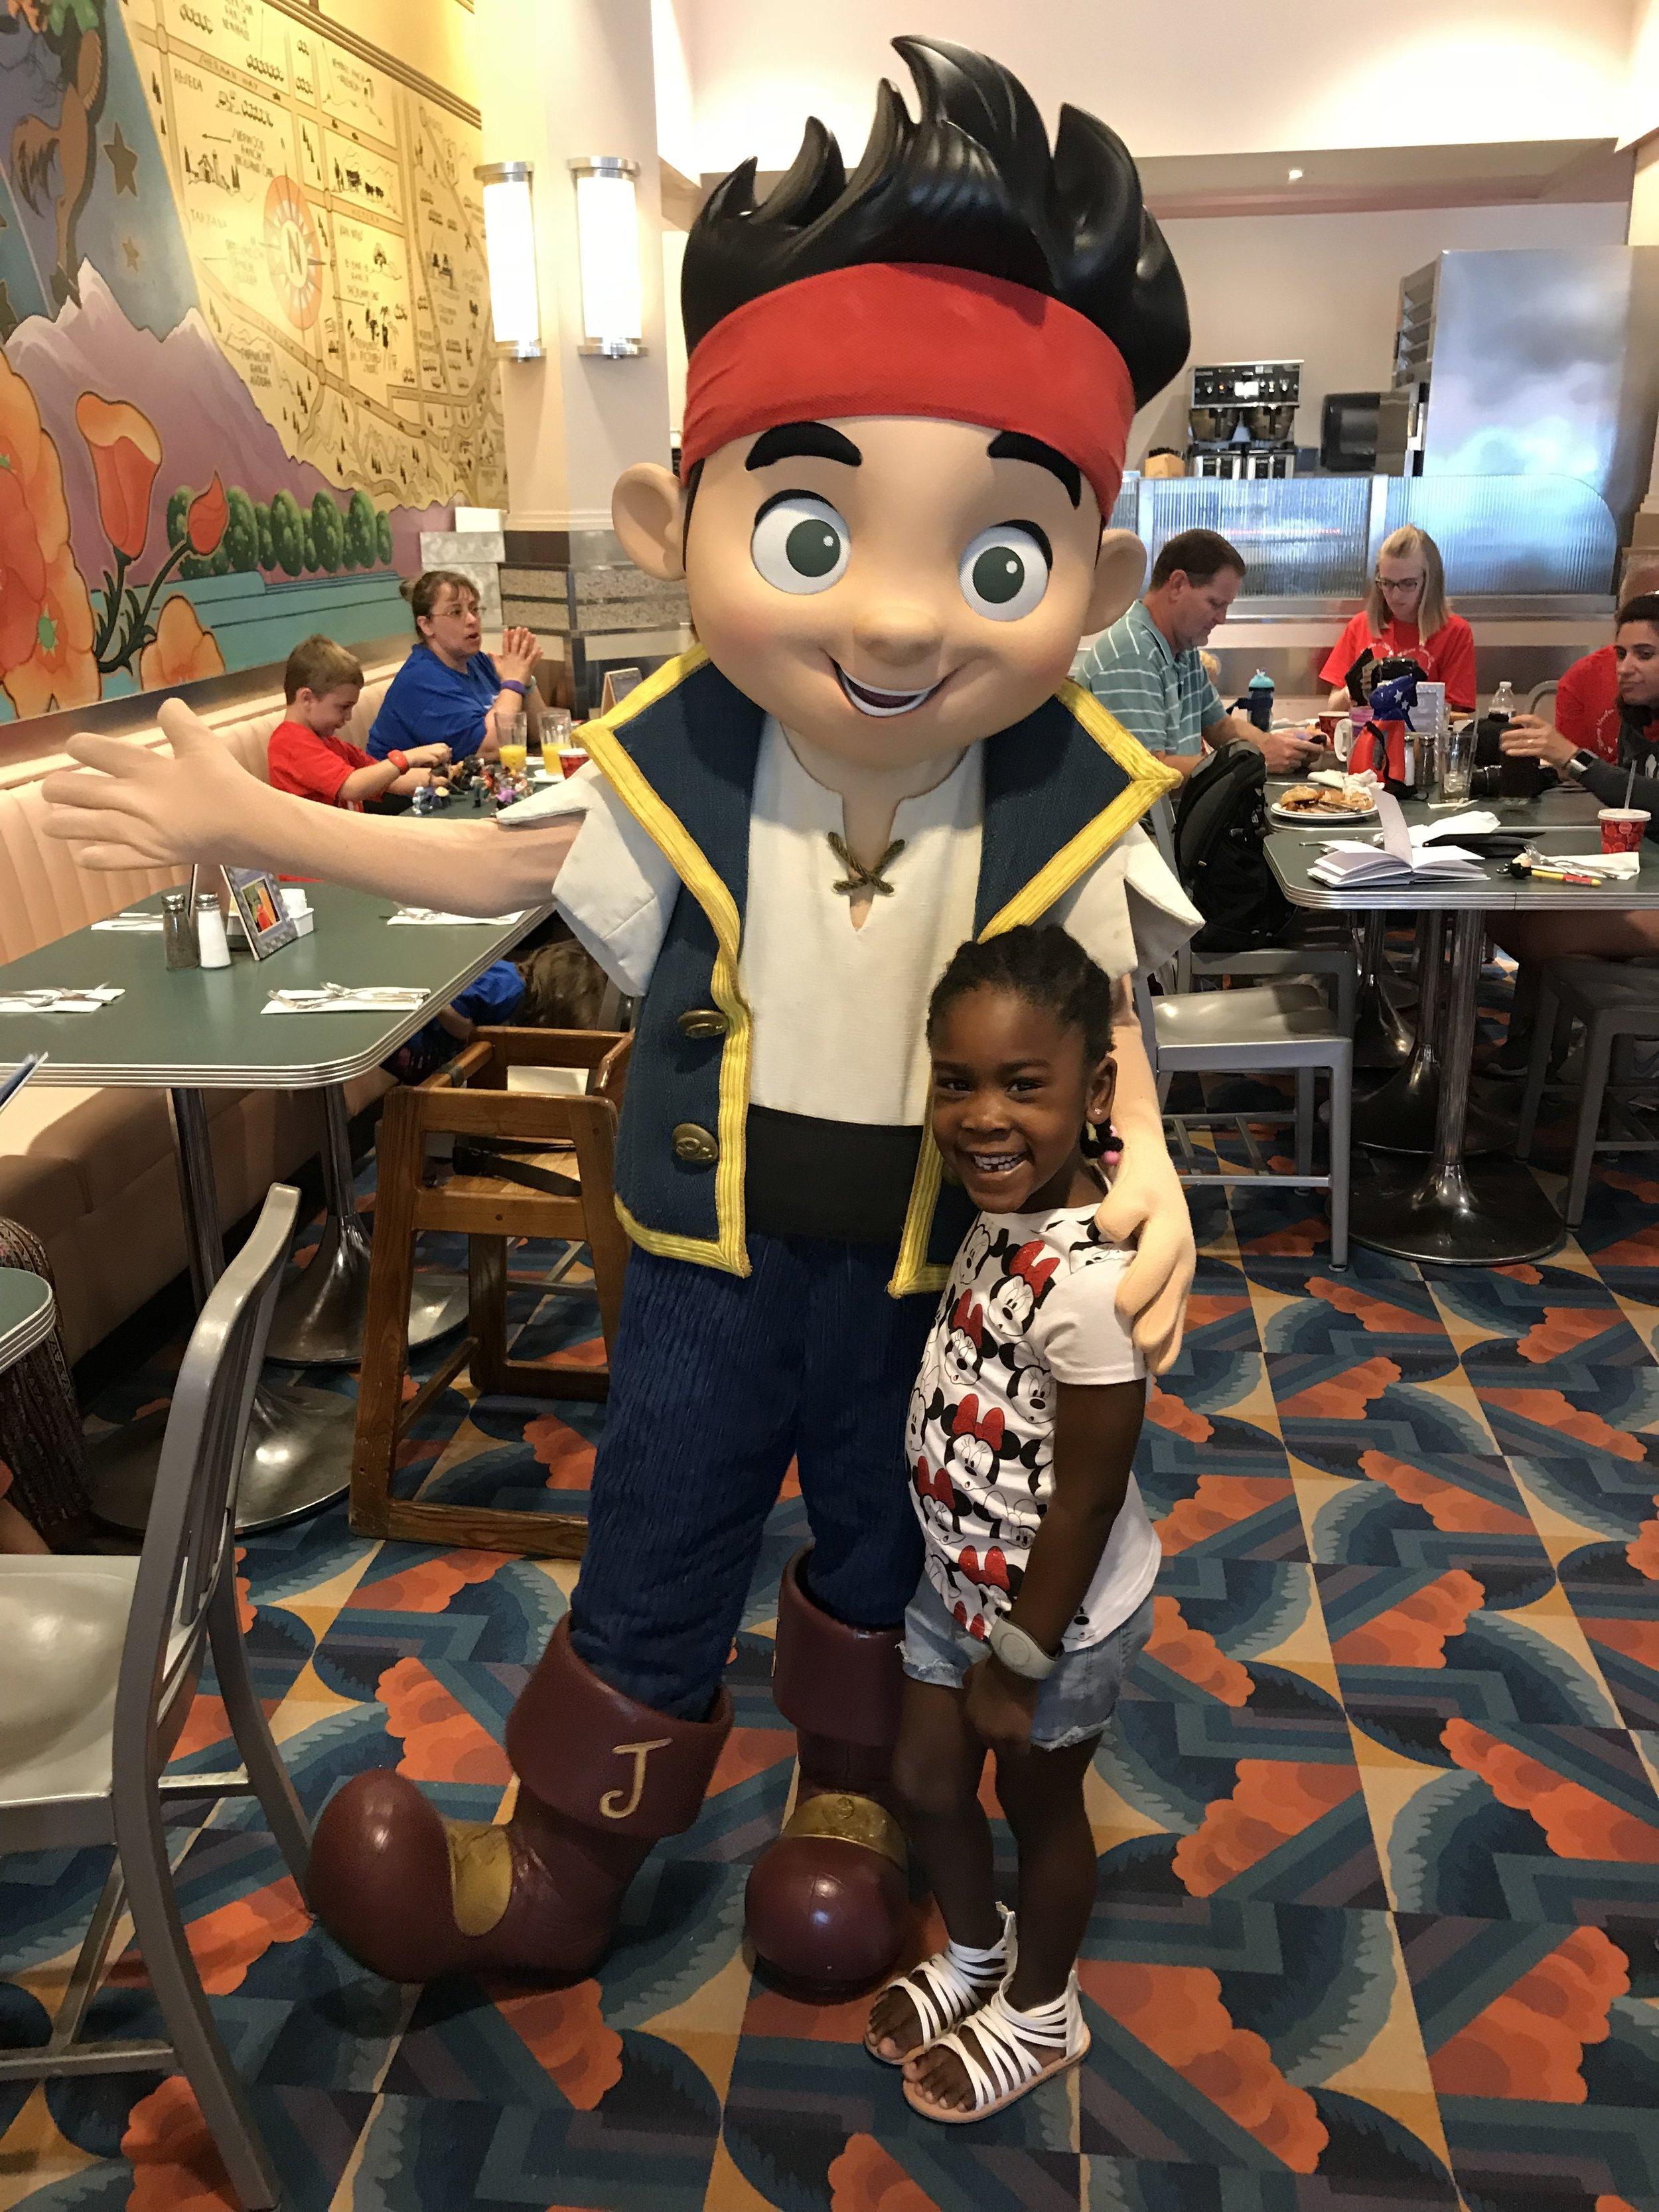 Disney-with-toddlers-magic-kingdom-8.jpg